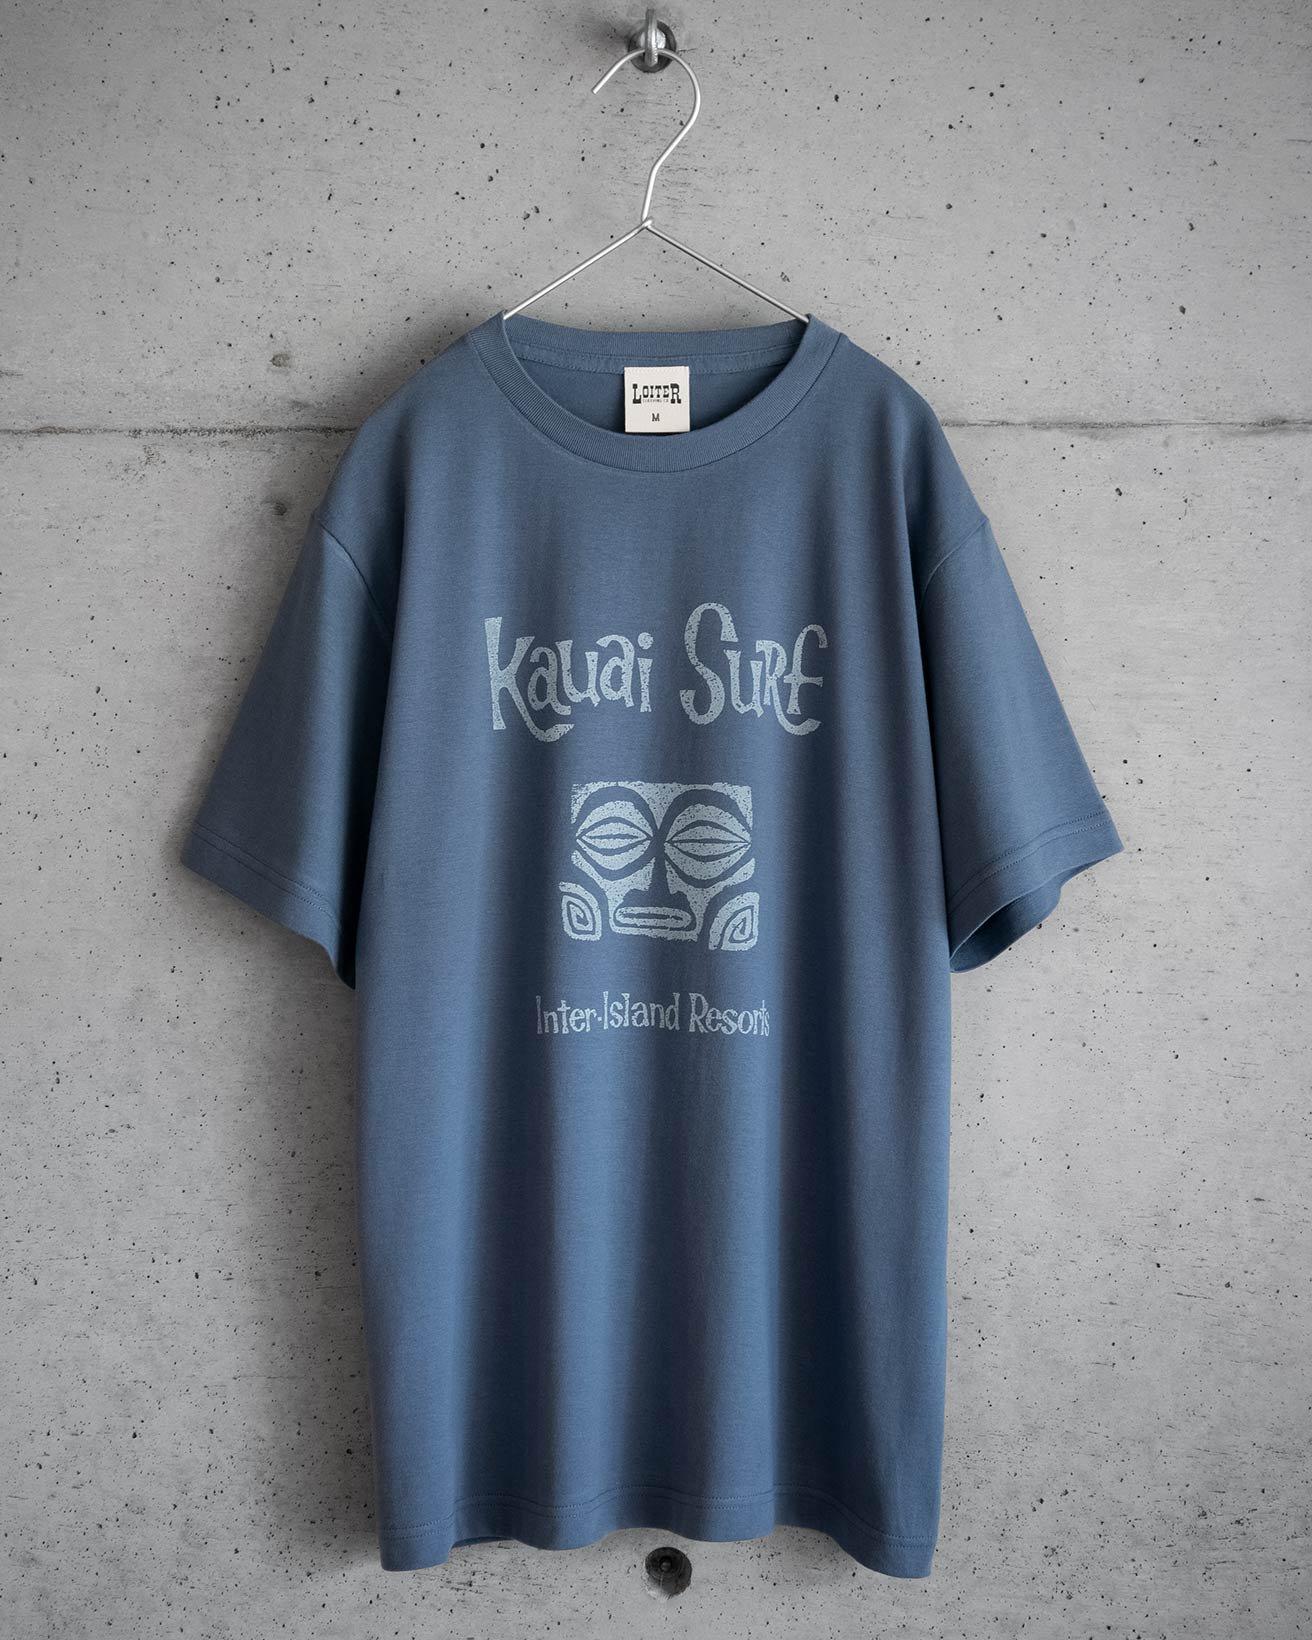 KAUAI SURF Tシャツ